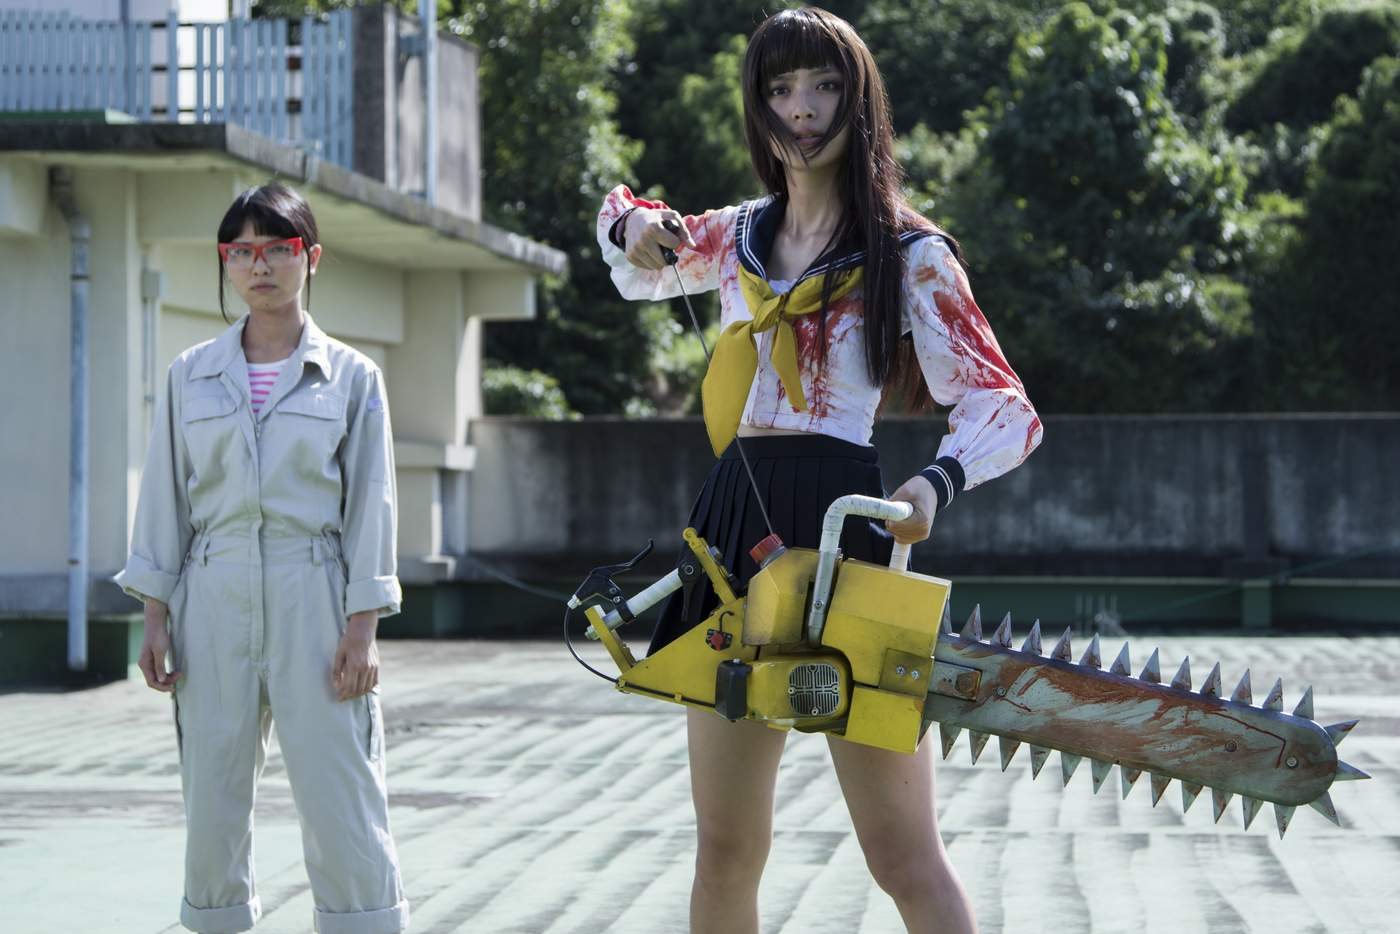 Rio Uchida (r) as Giko and (l) Seira Sato as Sayuri the Machine Shop girl in Bloody Chainsa Girl (2016)